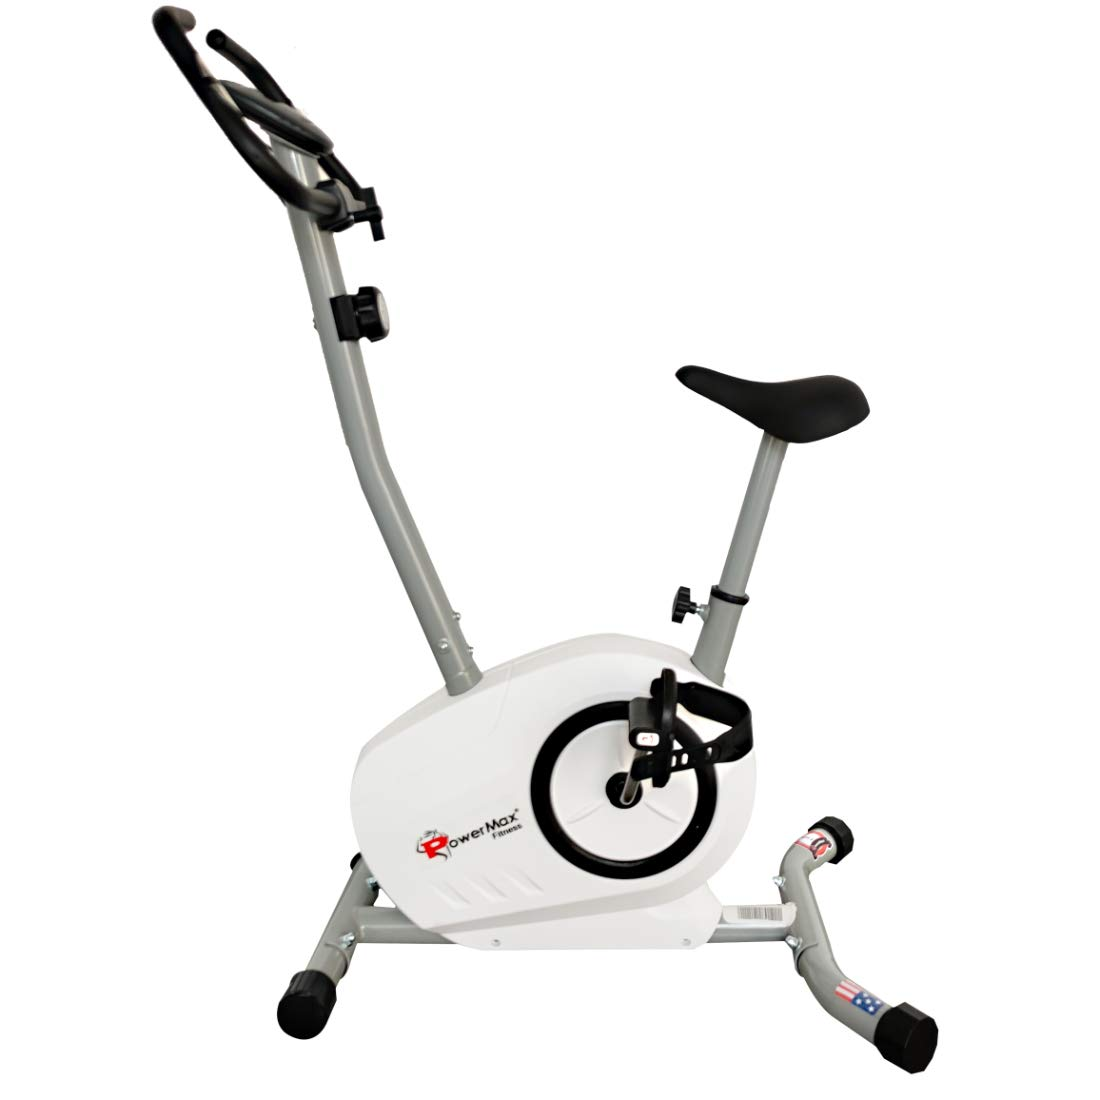 PowerMax Fitness BU-515-AL502 Steel Exercise Upright Bike